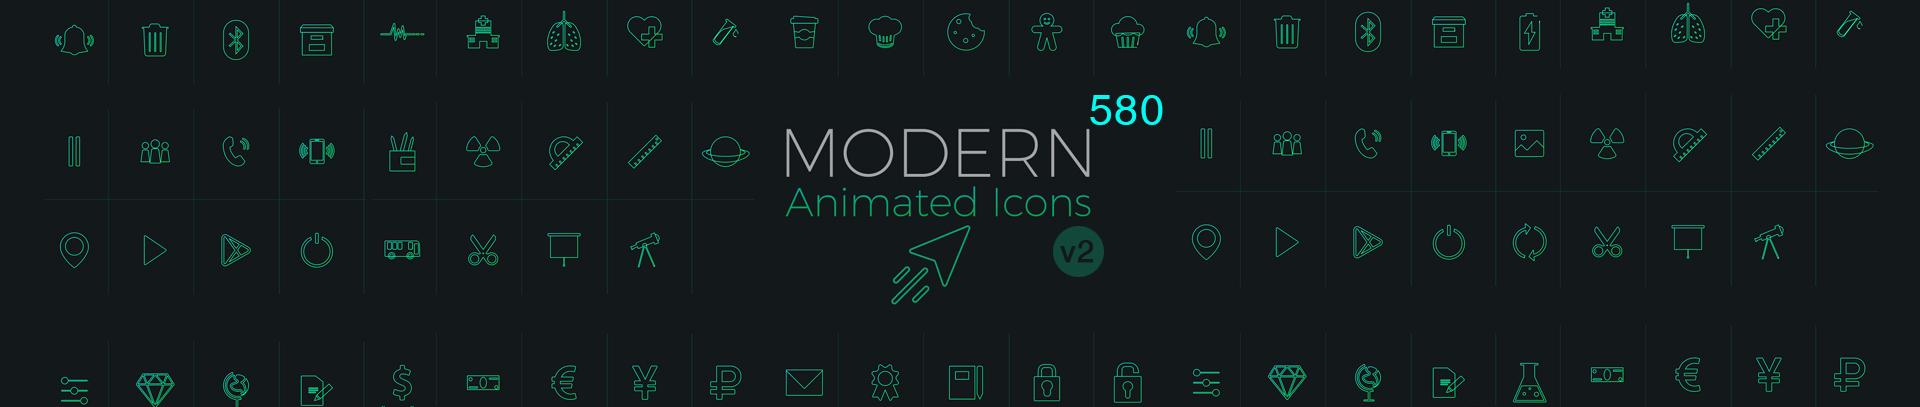 Modern-Animated-Icons-(slide)